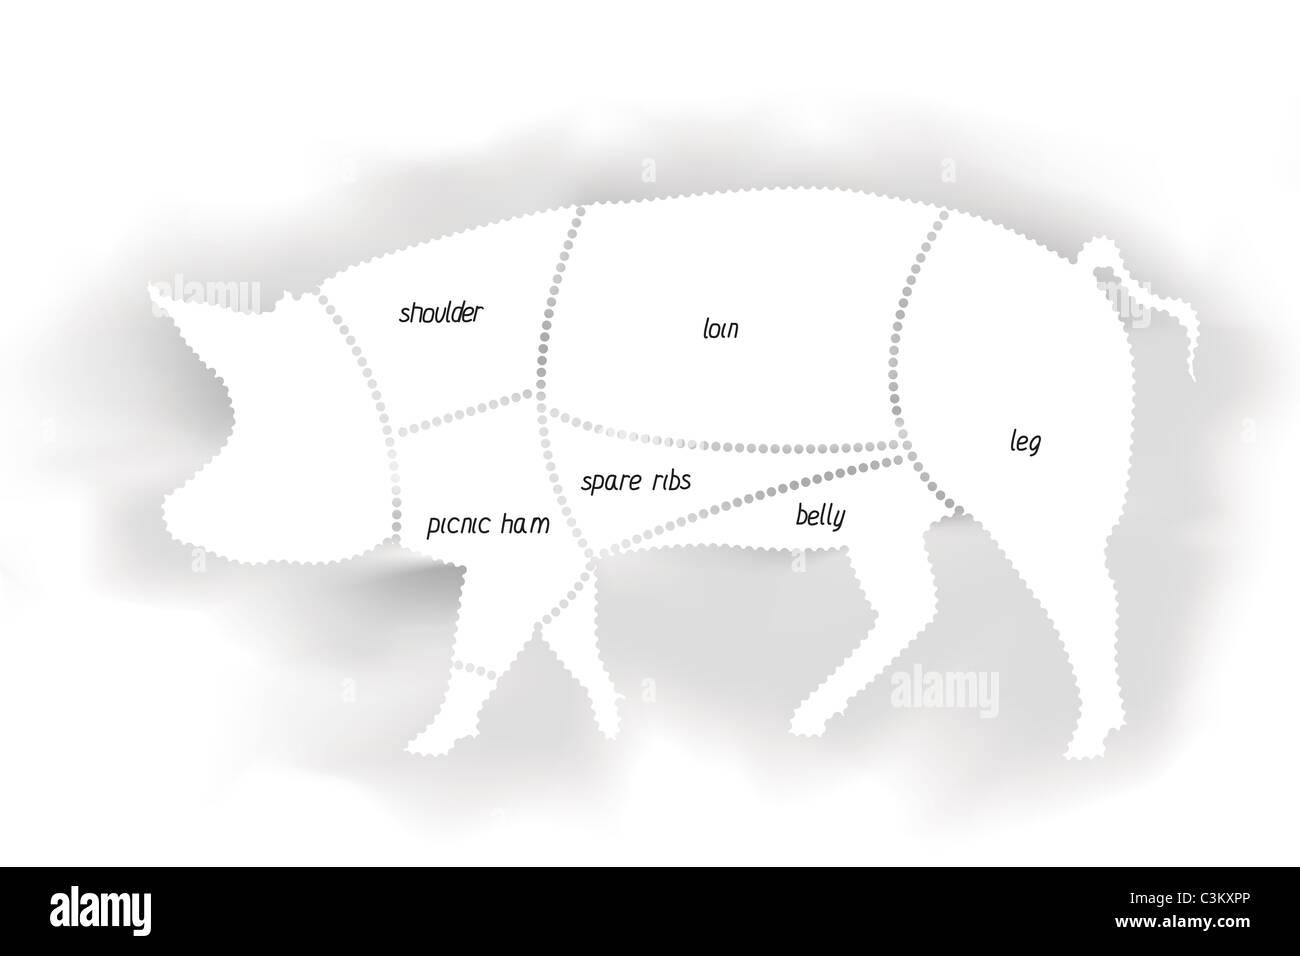 pork meat diagram C3KXPP meat diagram stock photos & meat diagram stock images alamy